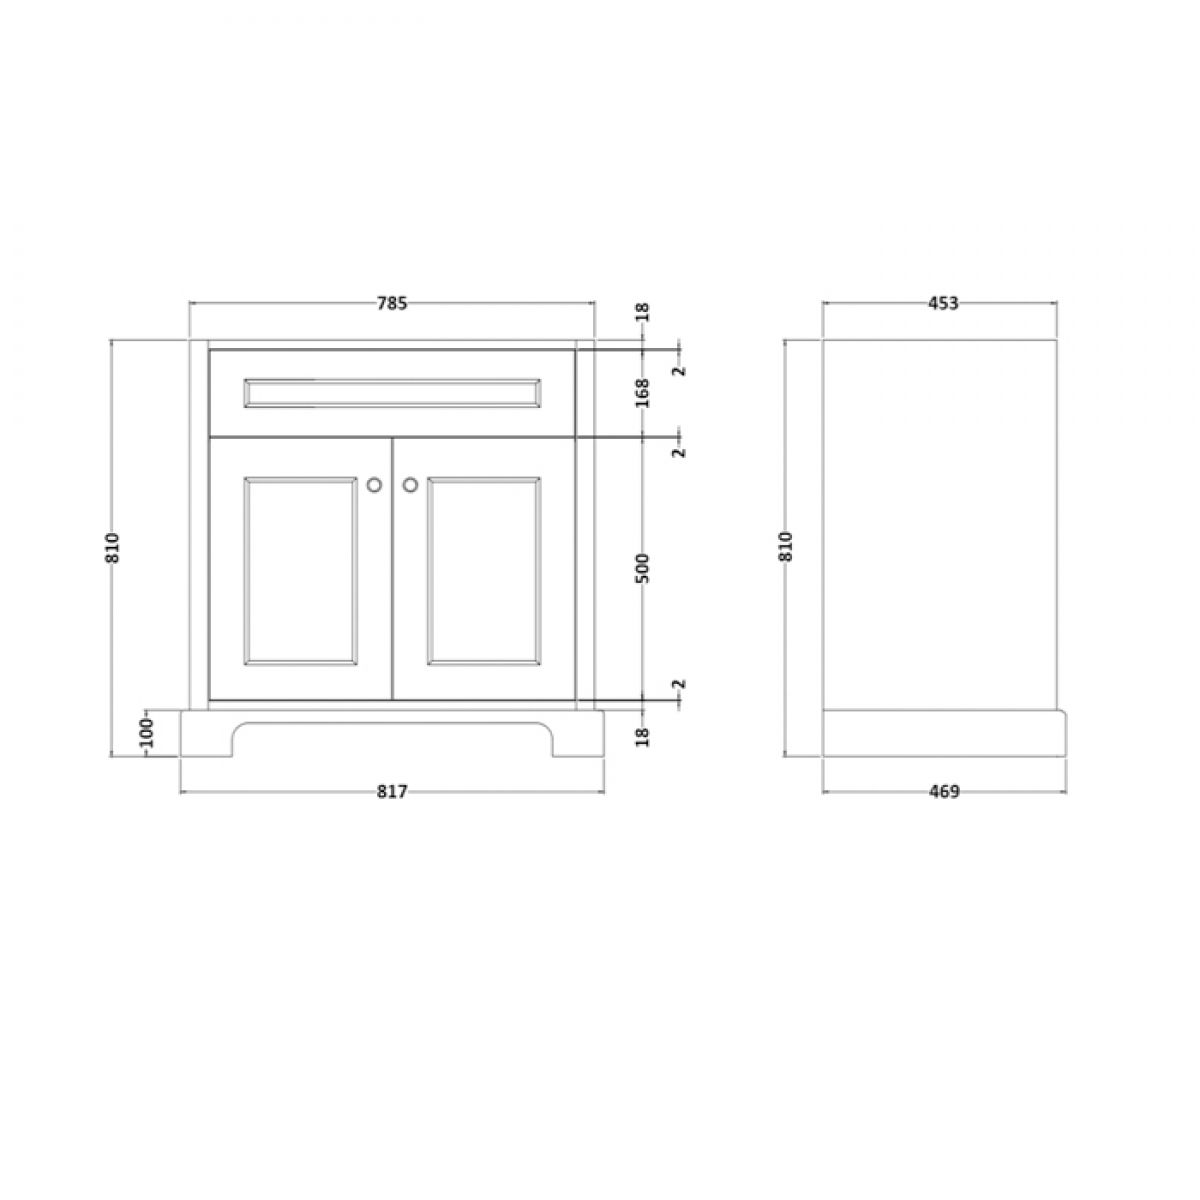 RAK Washington Grey Vanity Unit with Grey Countertop 800mm Measurements